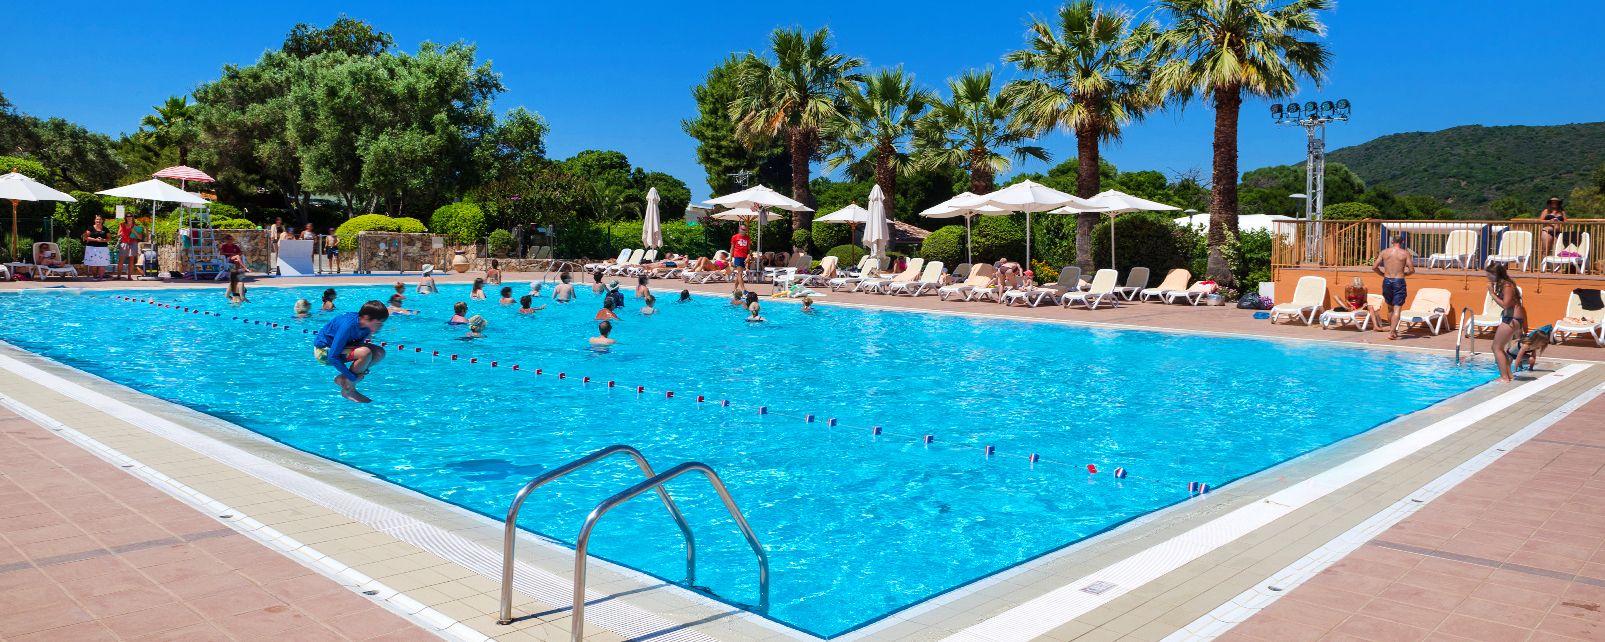 Club Med de Cargèse